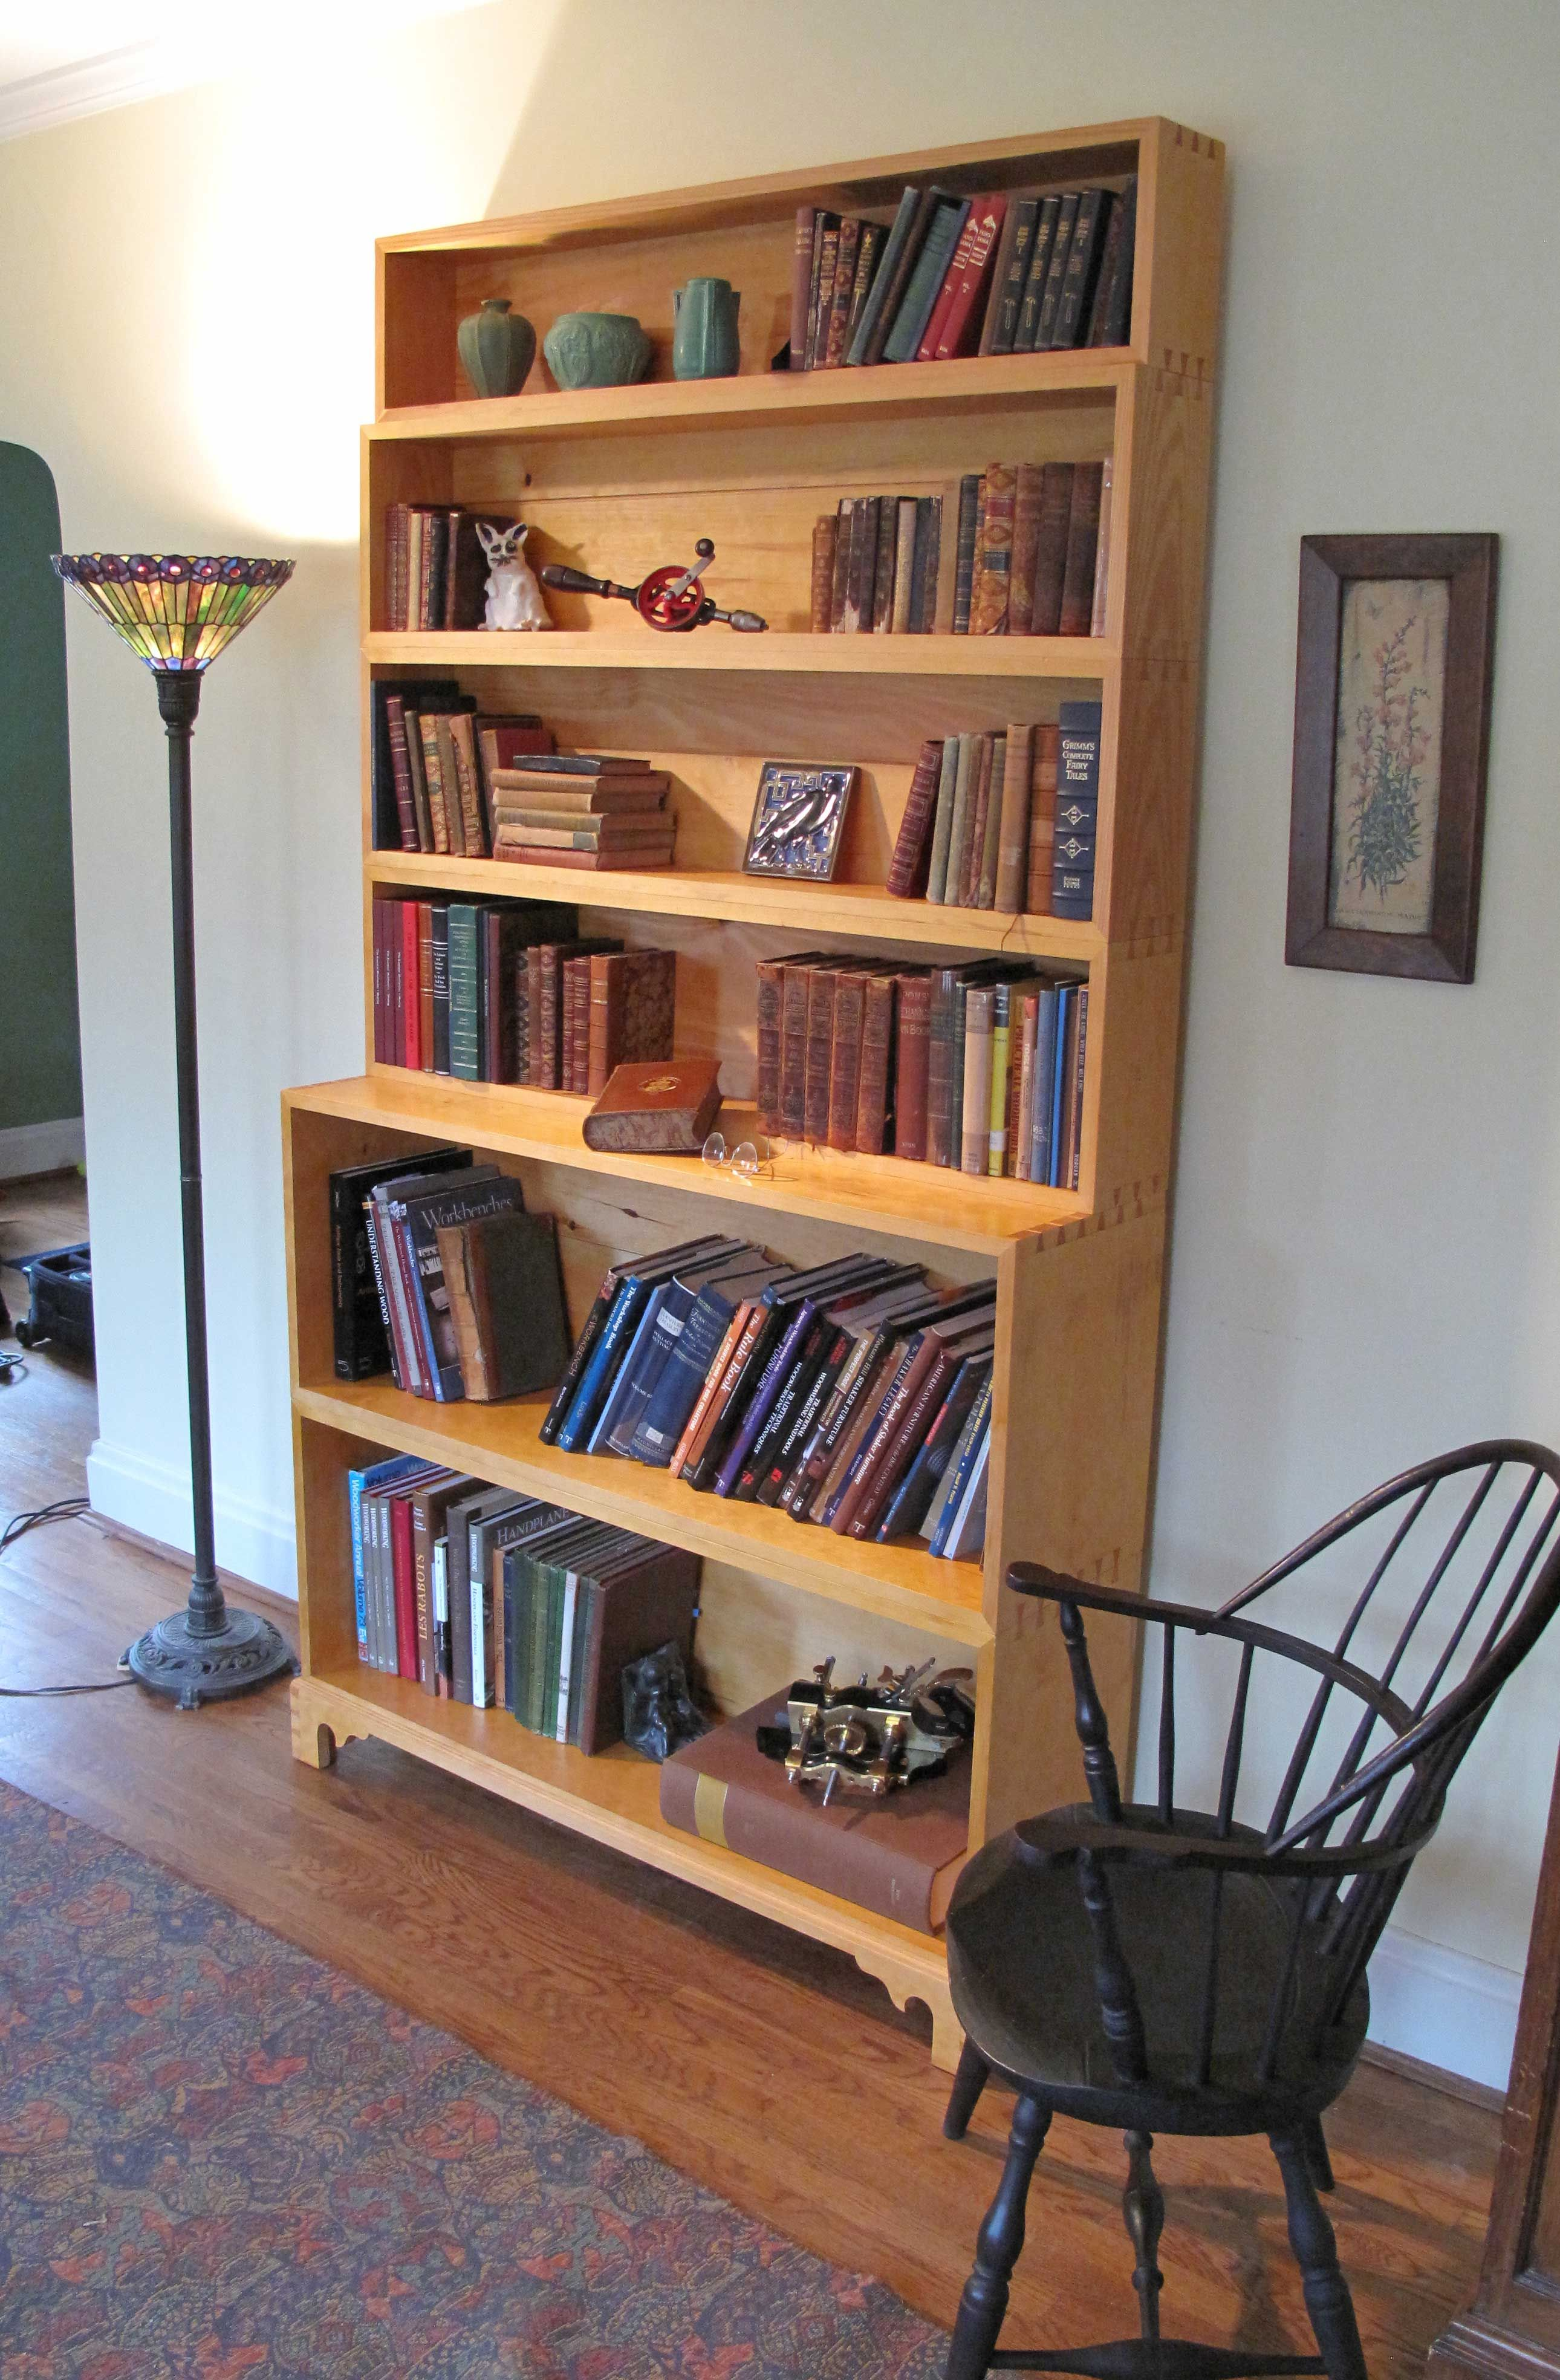 Photo Shoot Monticello Bookcases Popular Woodworking Magazine Bookcase Popular Woodworking Built In Bookcase